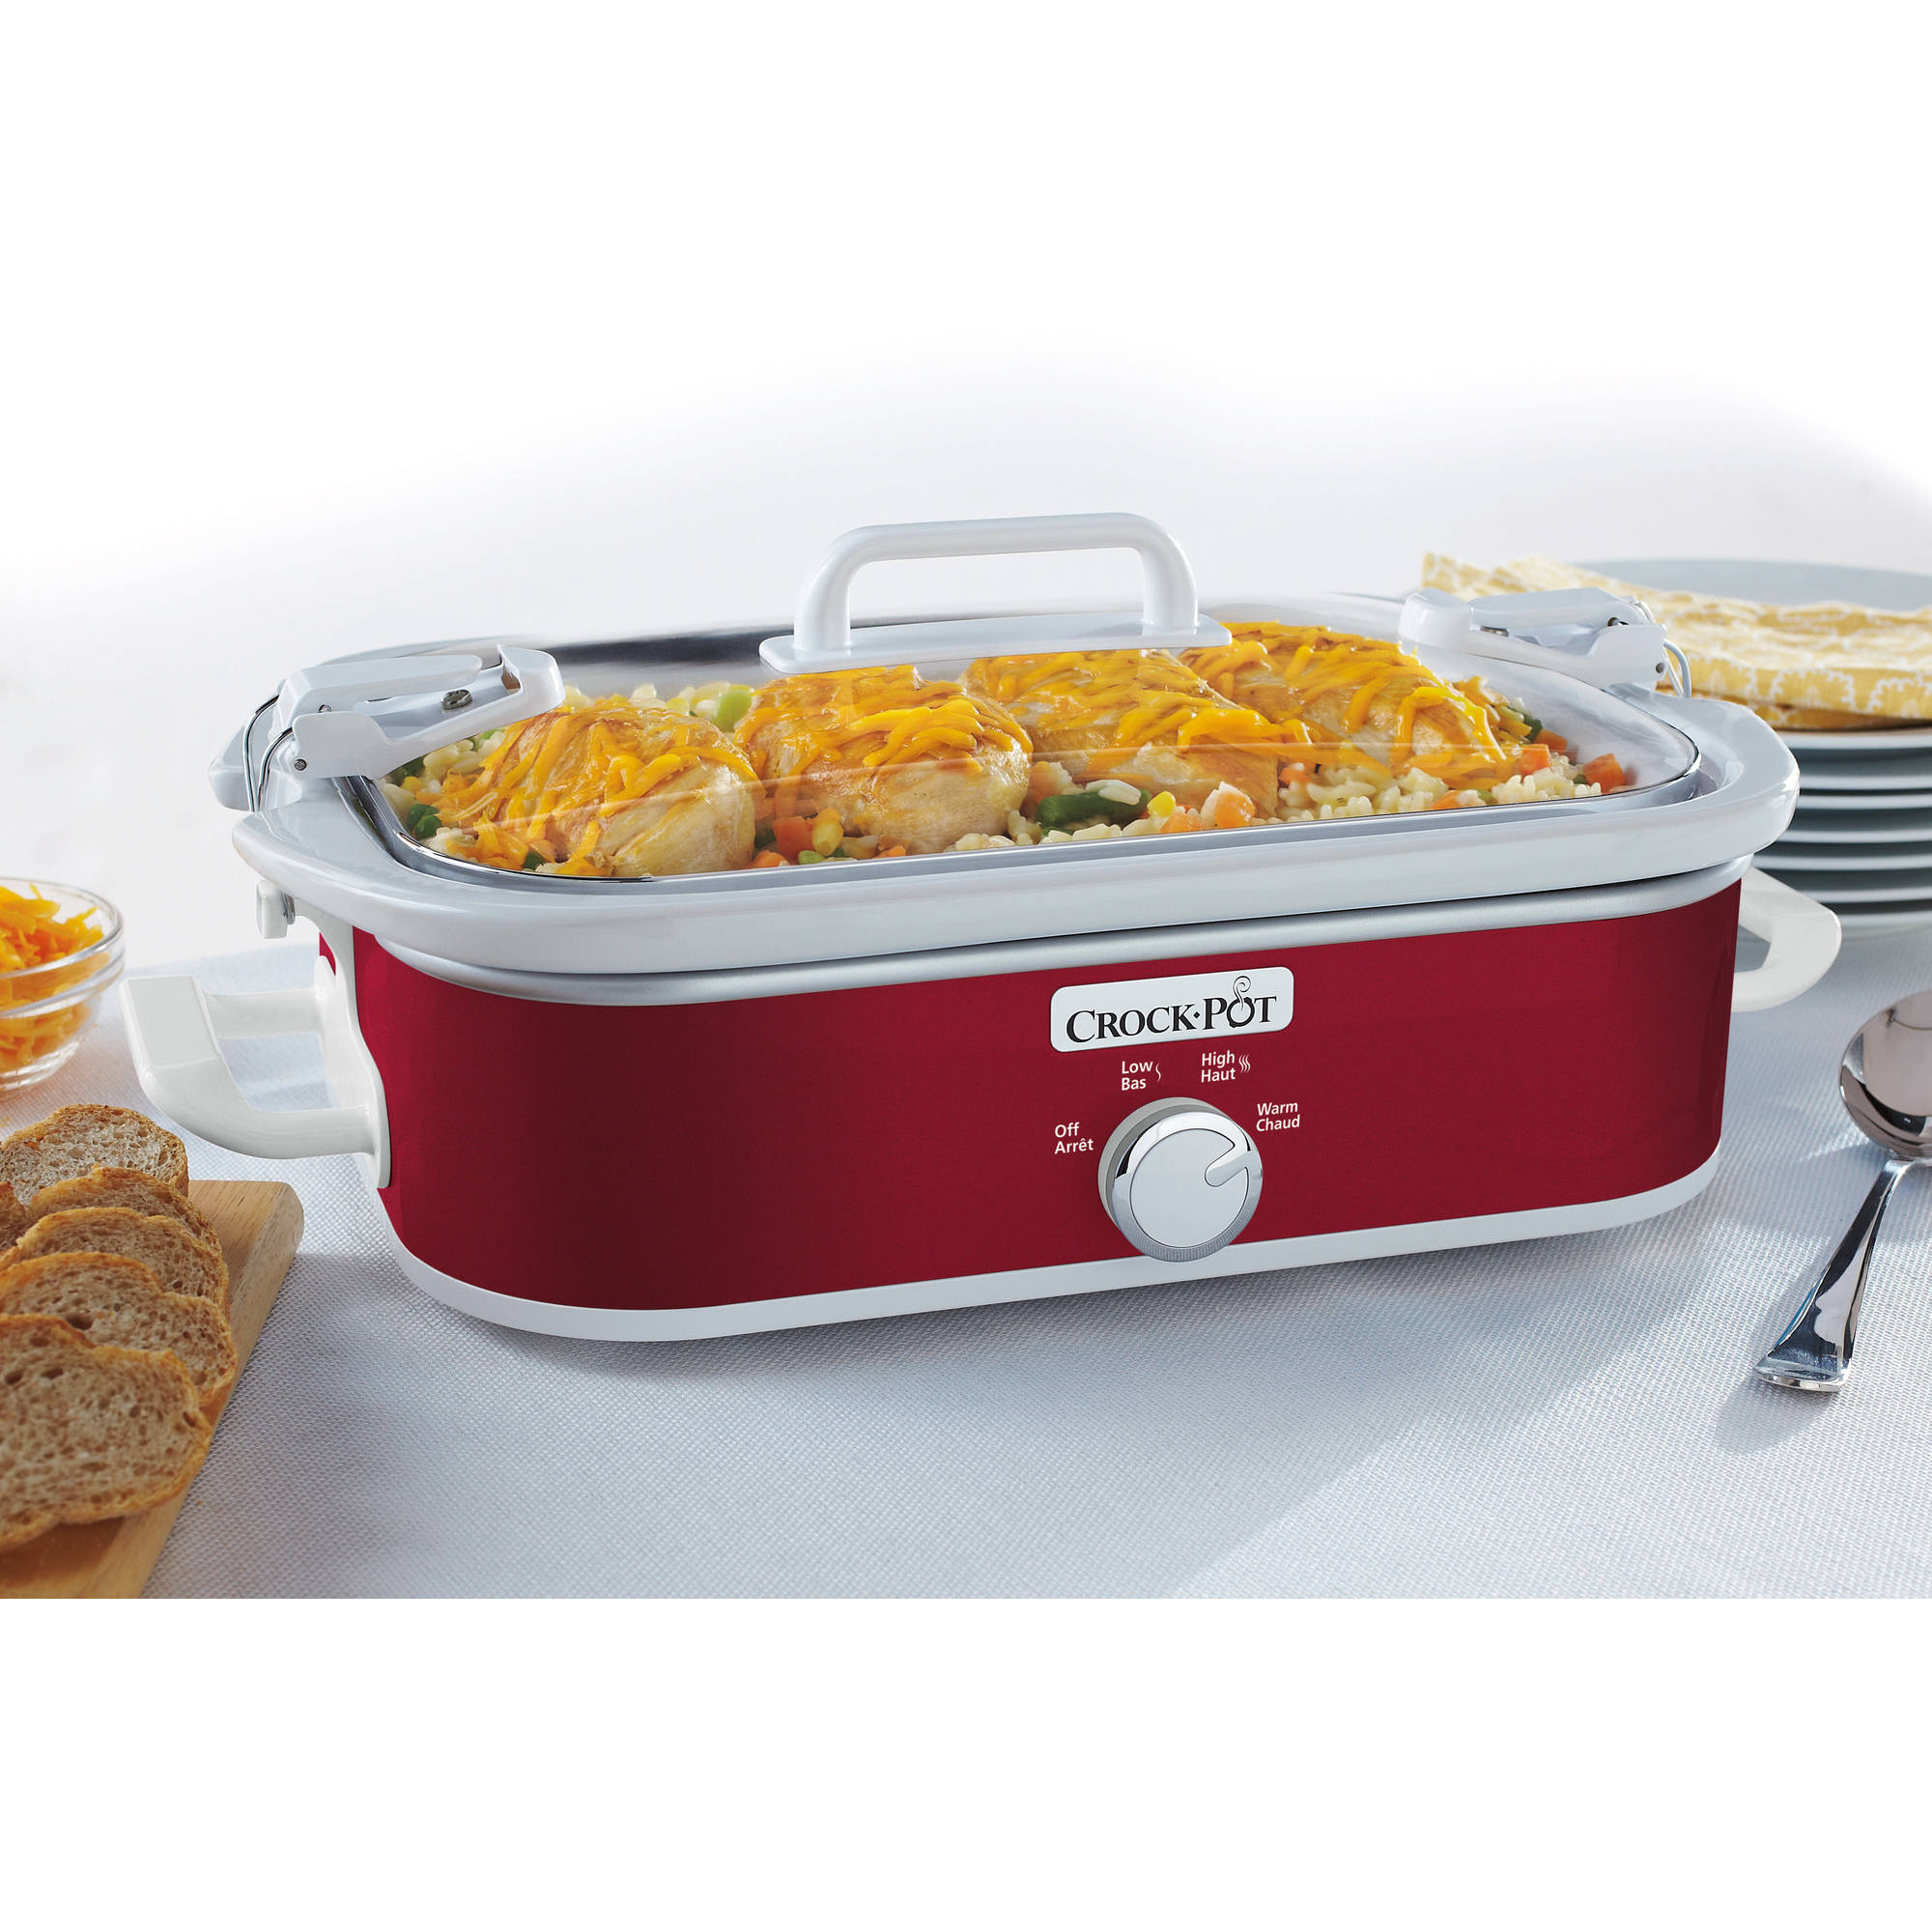 Crock-Pot Casserole Crock 3.5-Quart Slow Cooker